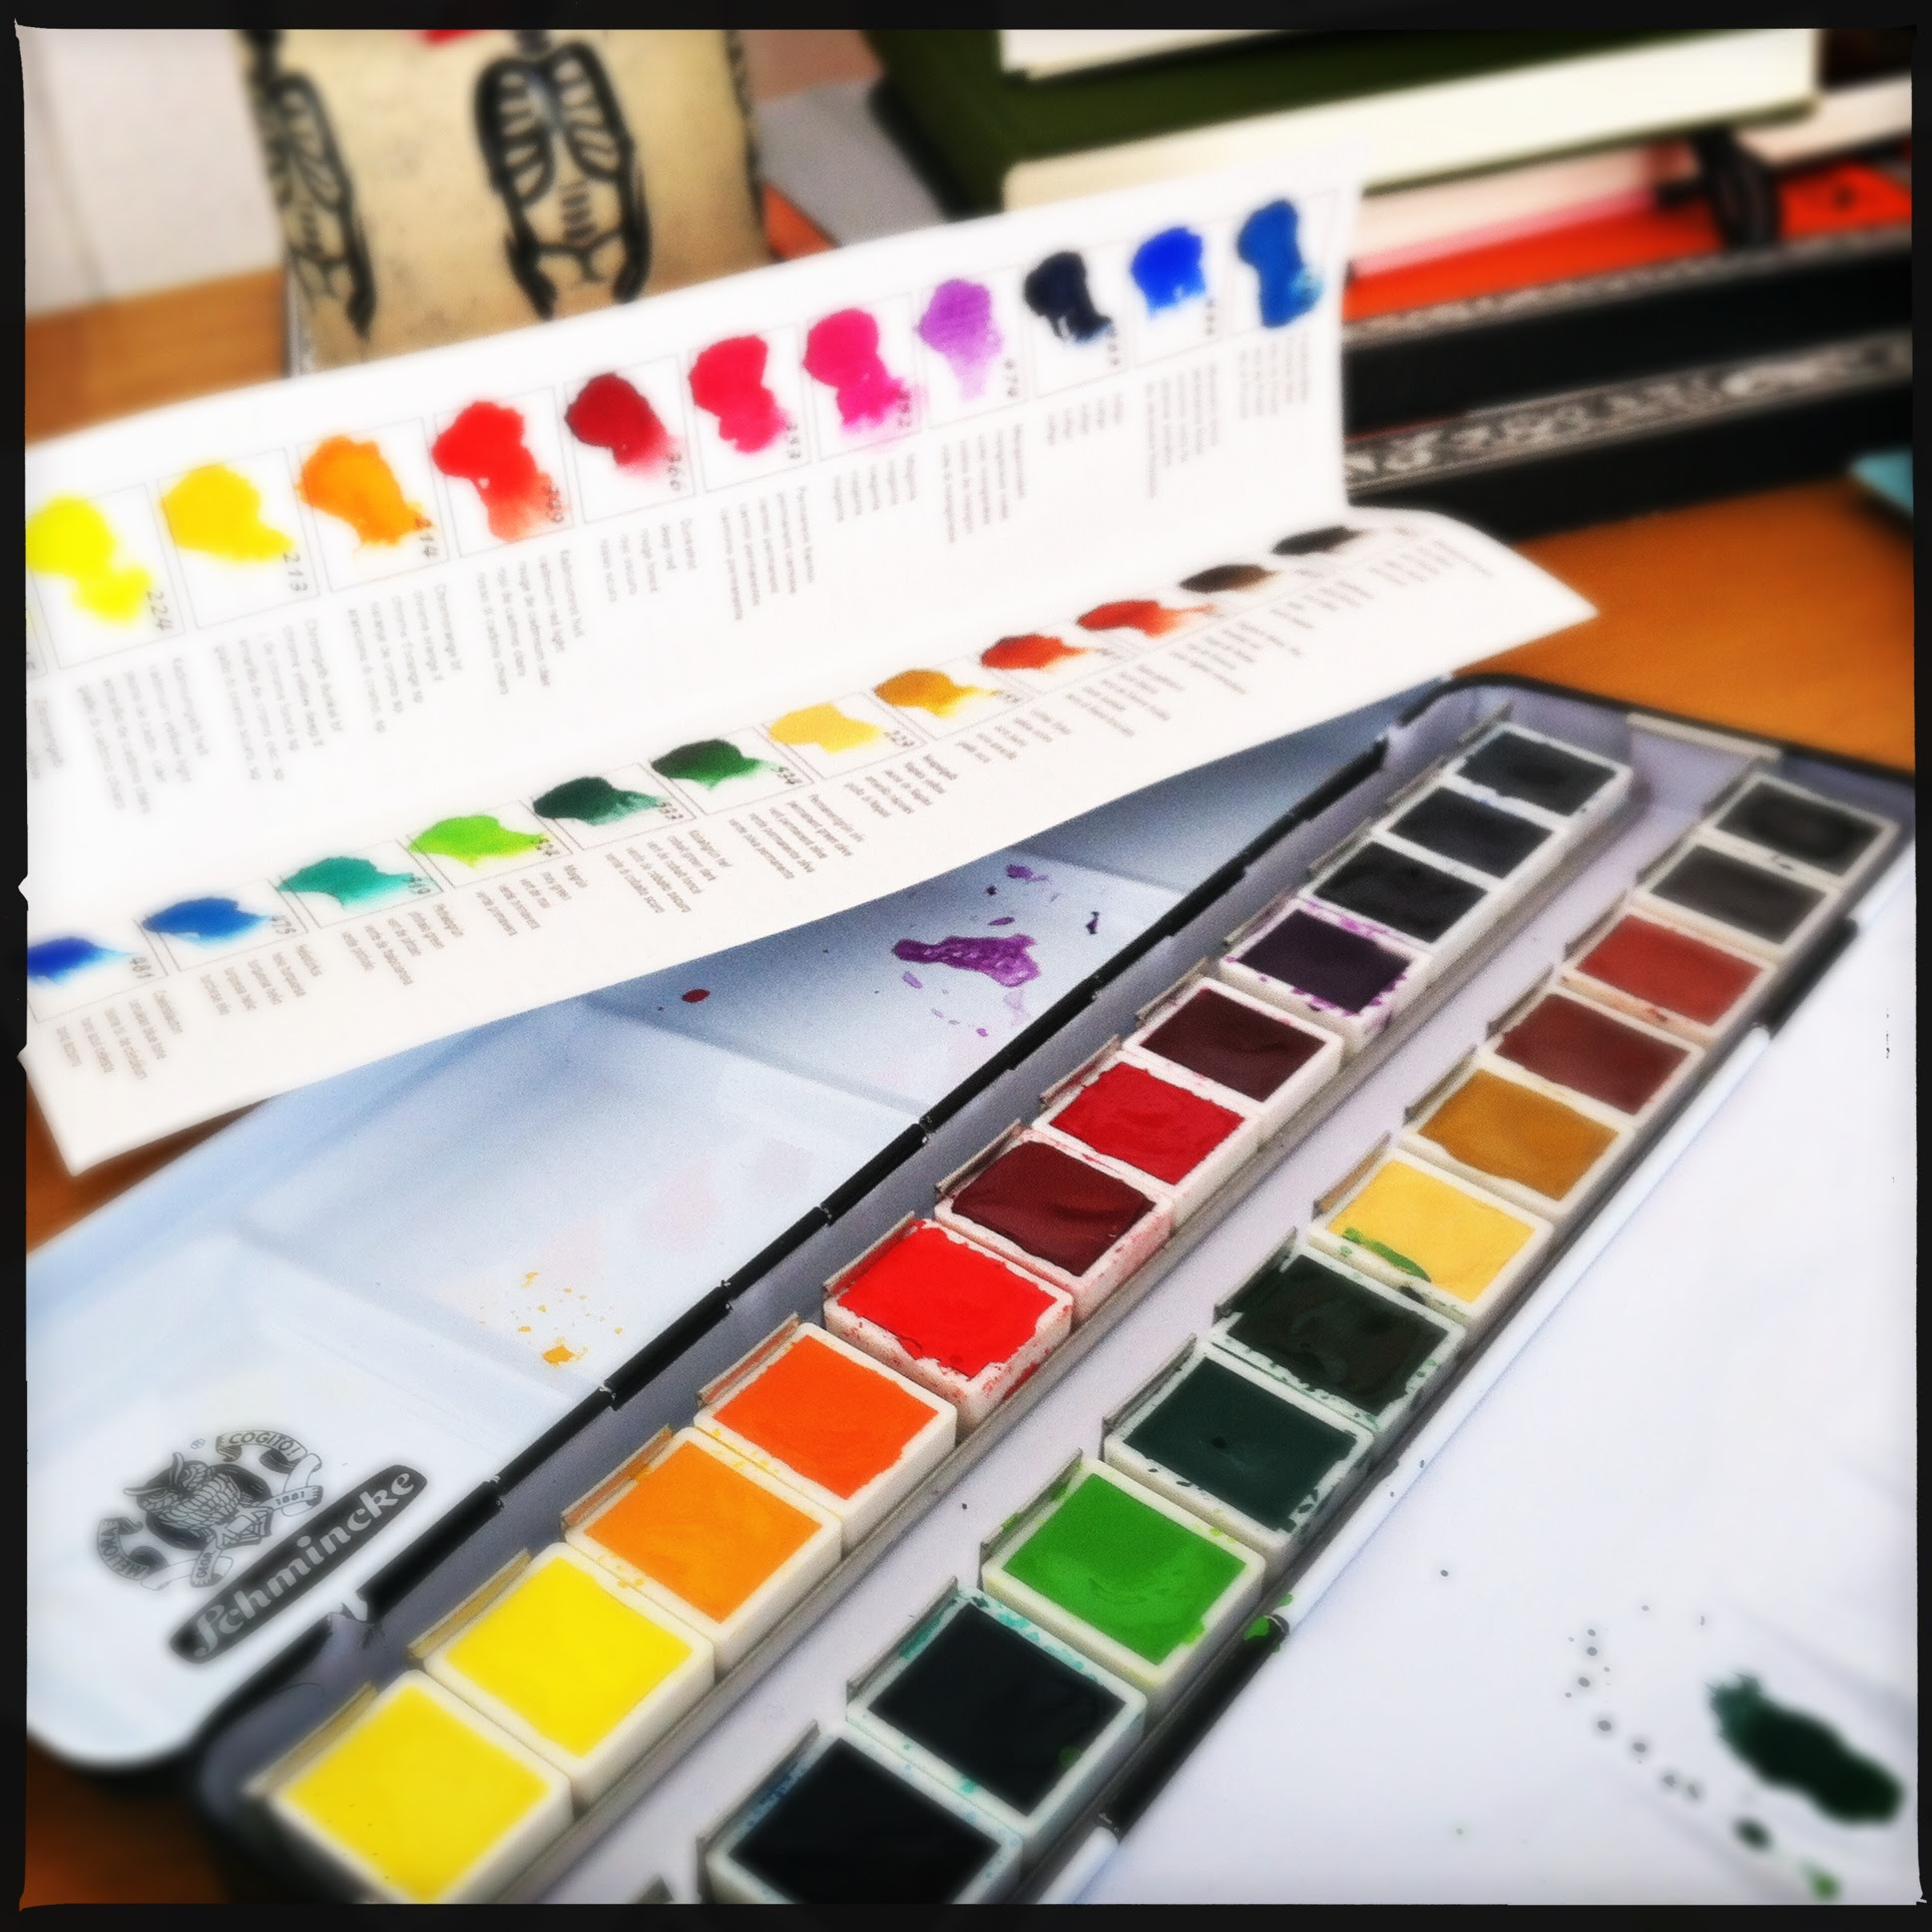 new travel set of watercolors